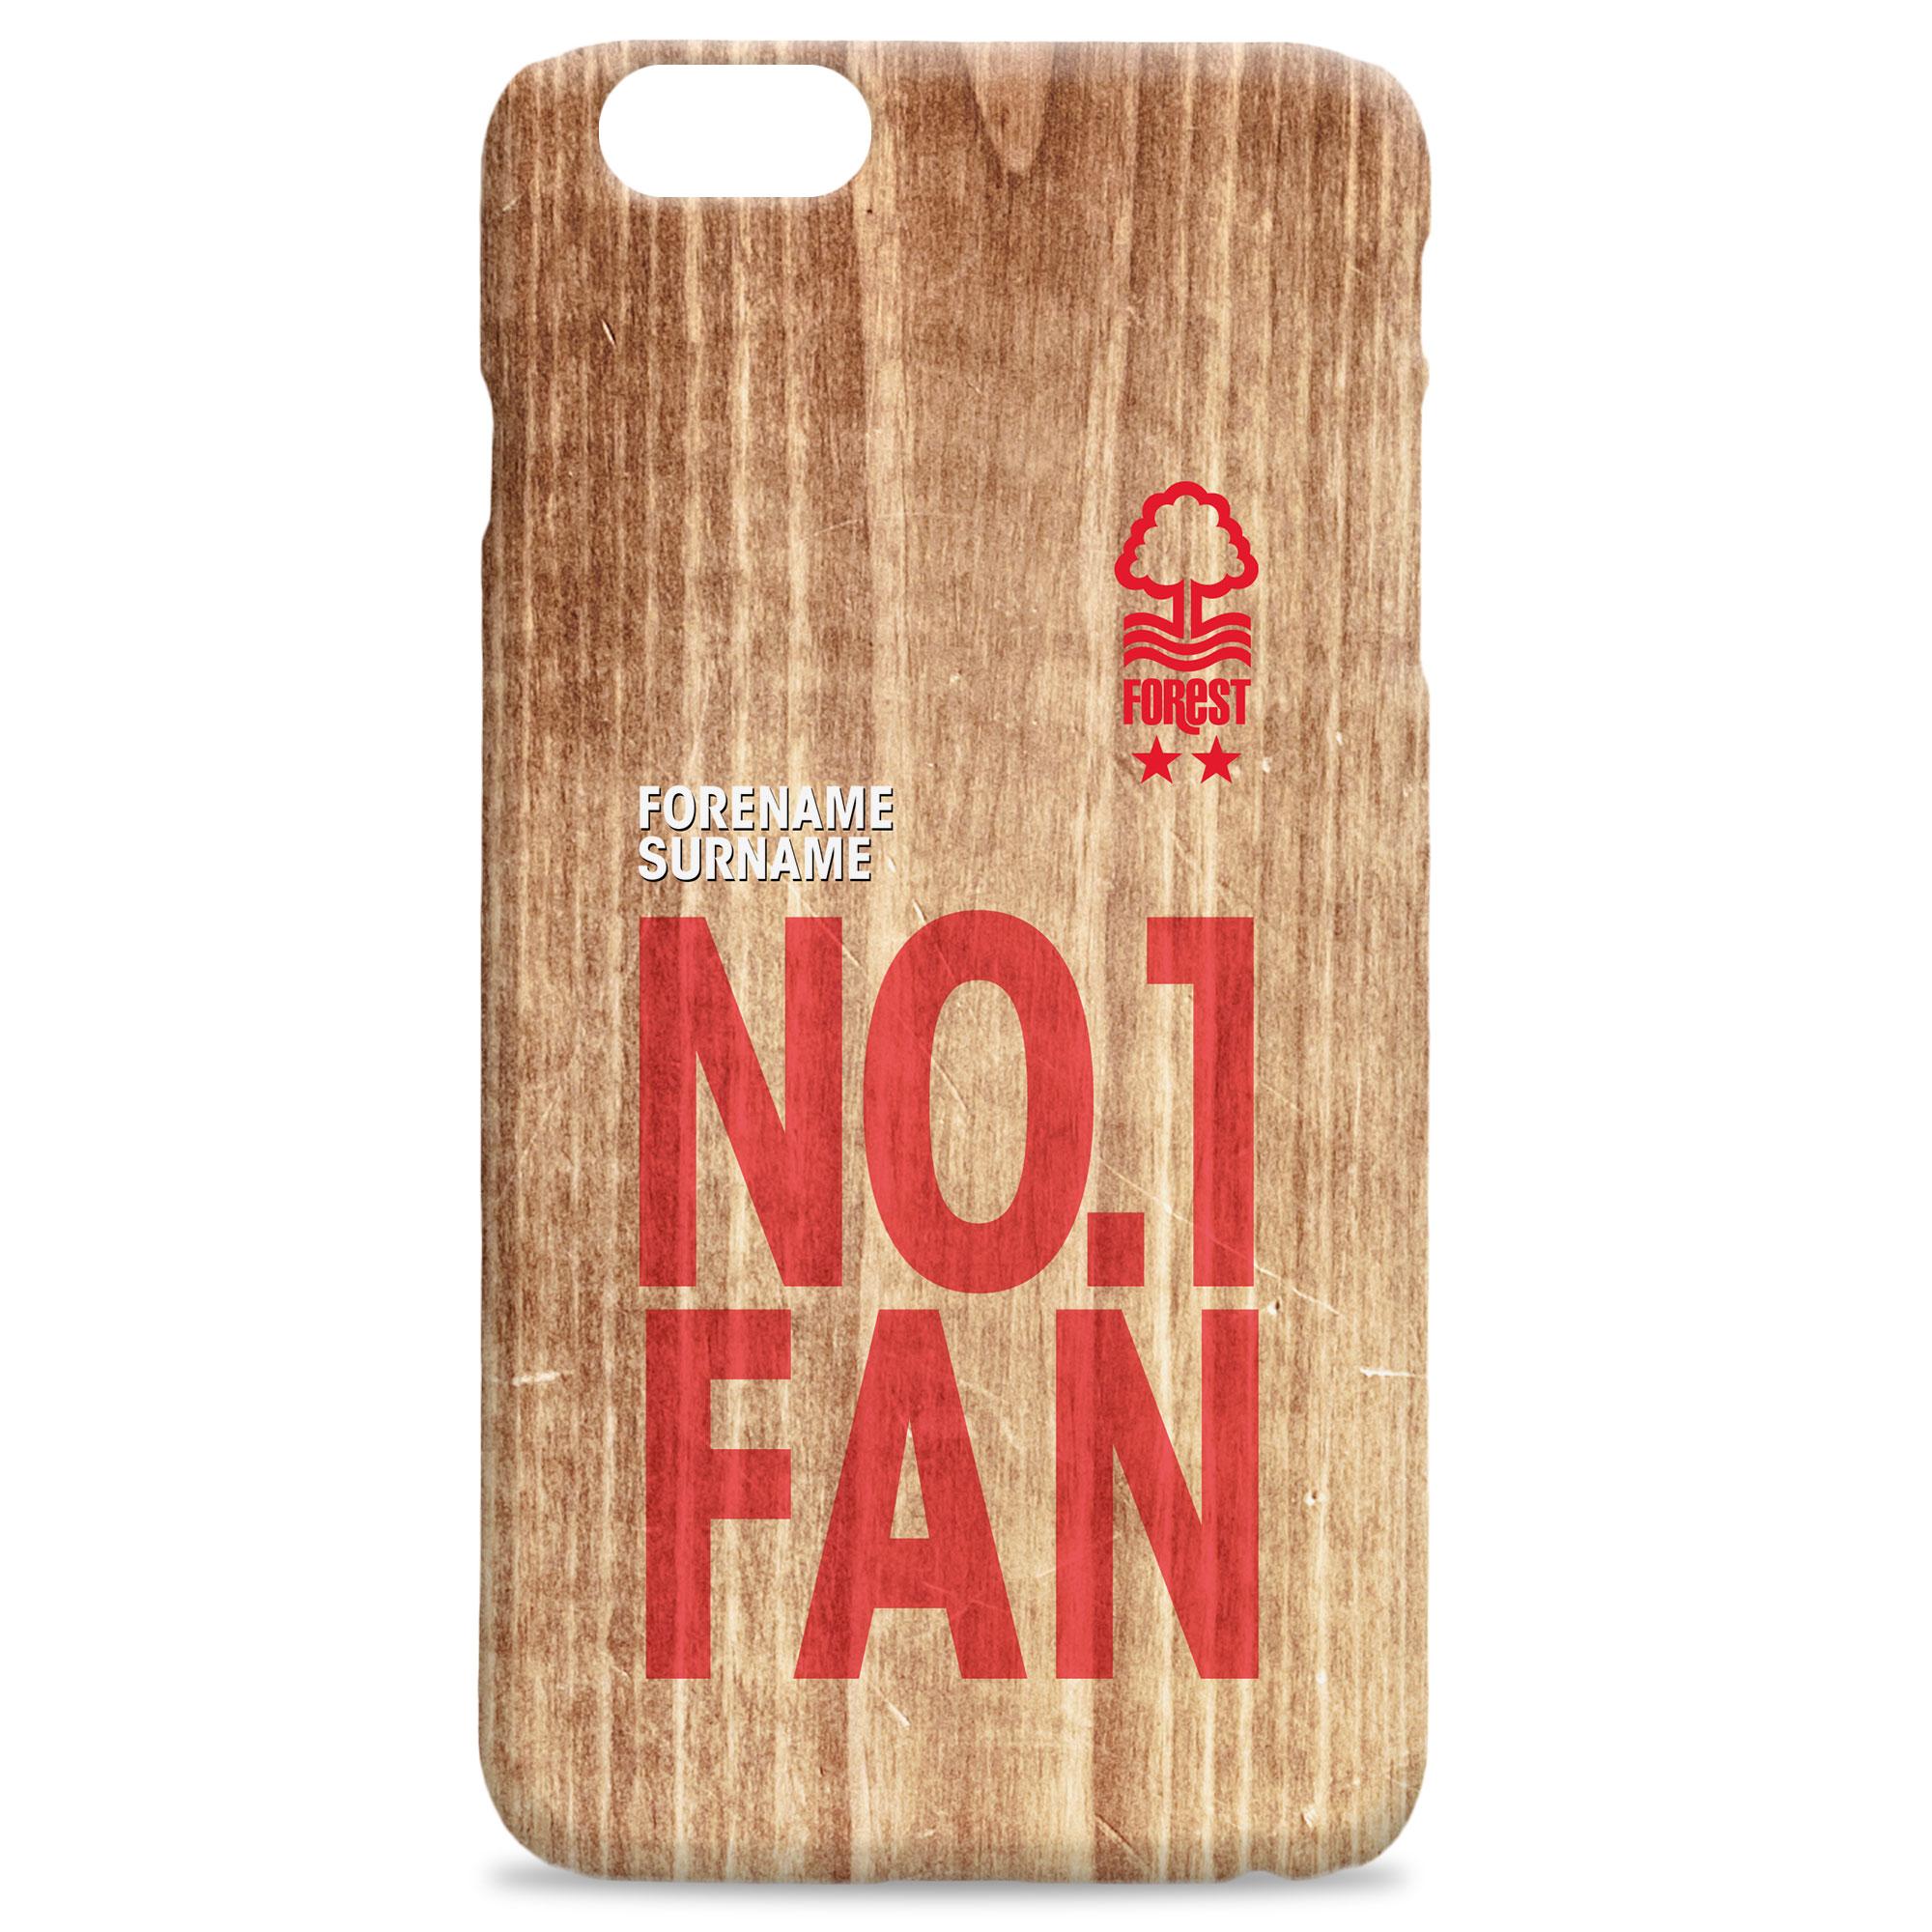 Nottingham Forest FC No 1 Fan Hard Back Phone Case